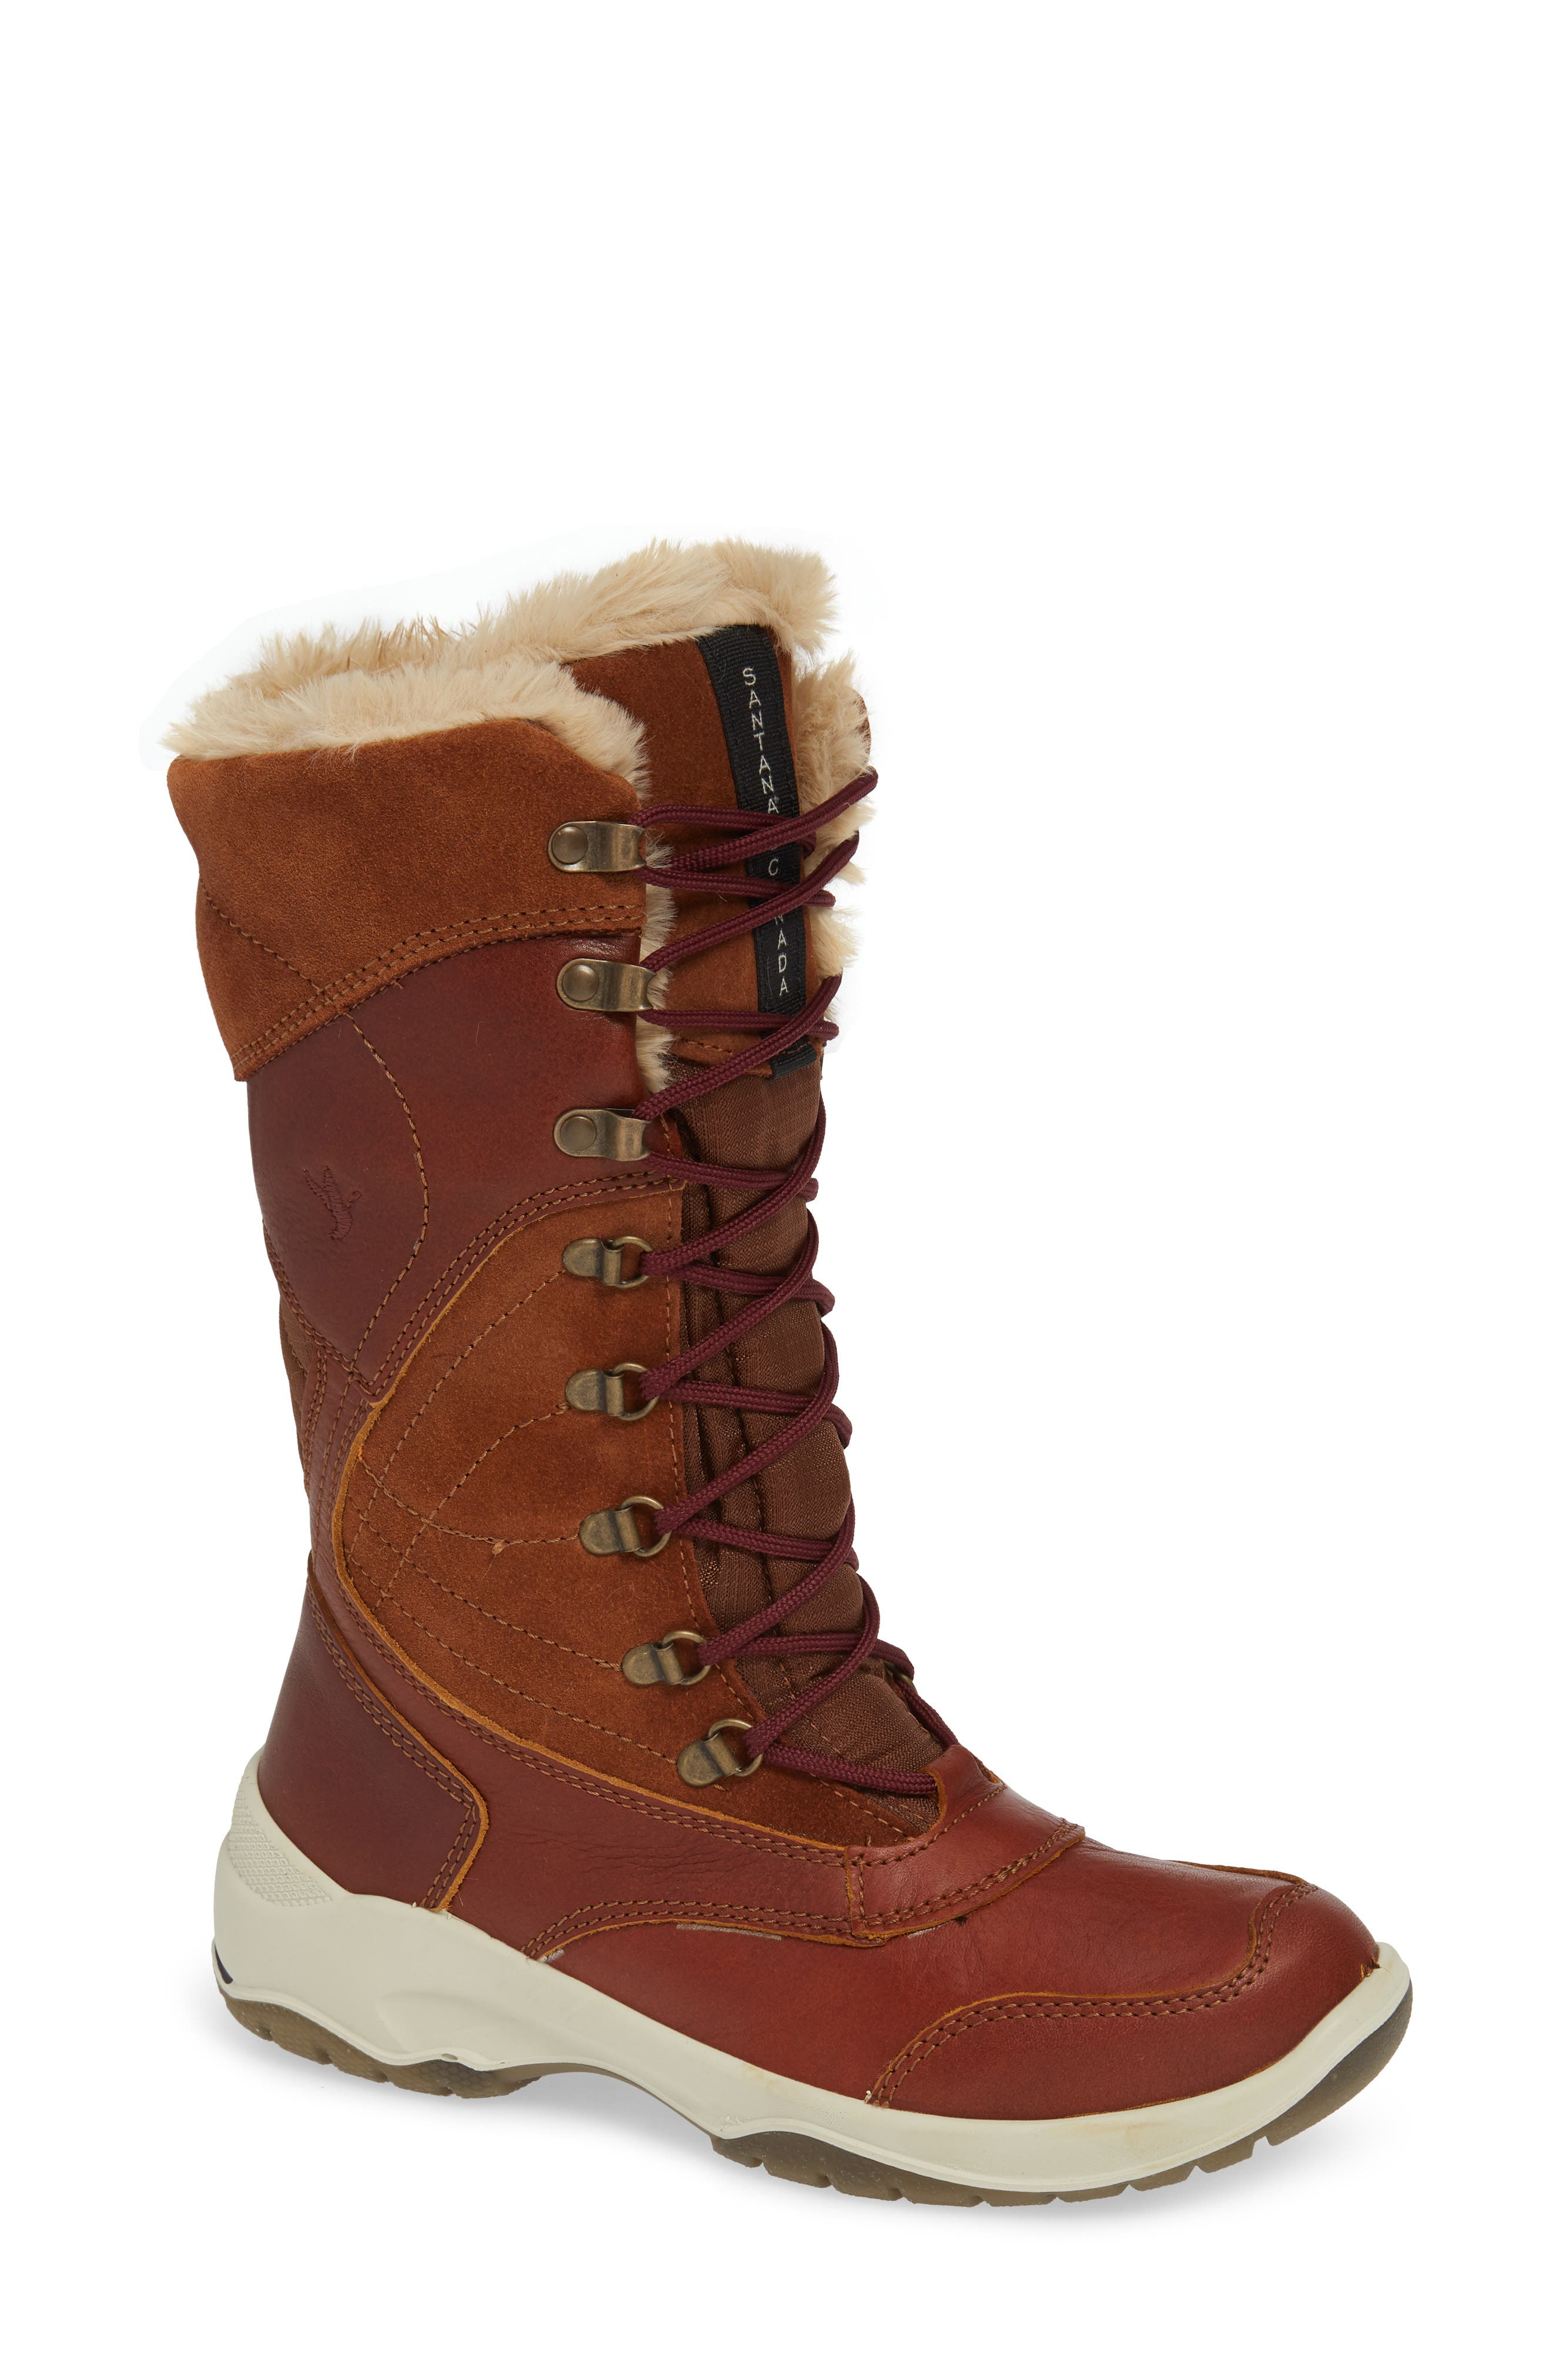 Santana Canada Topspeed Luxe Waterproof Snow Boot